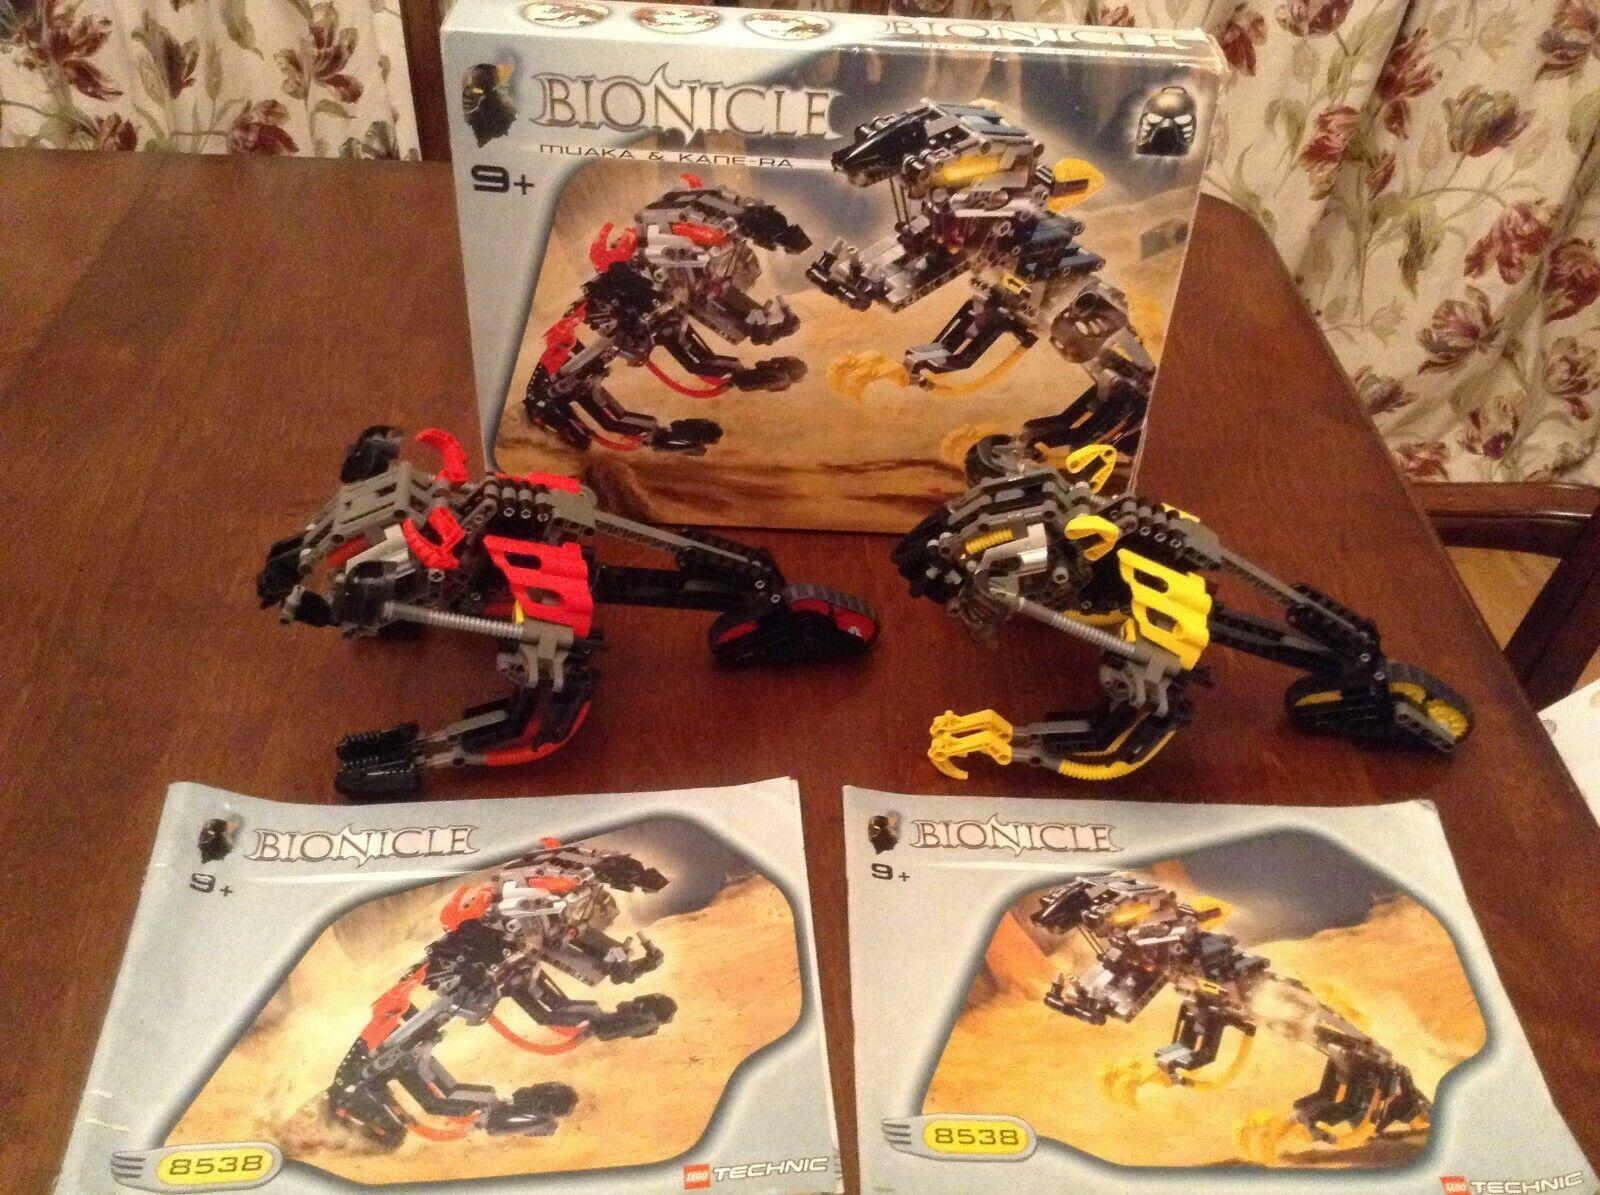 LegoTechnic Bionicle 8538 Muaka & Kane-Ra, 9 + ans RARE   pas cher et de la mode